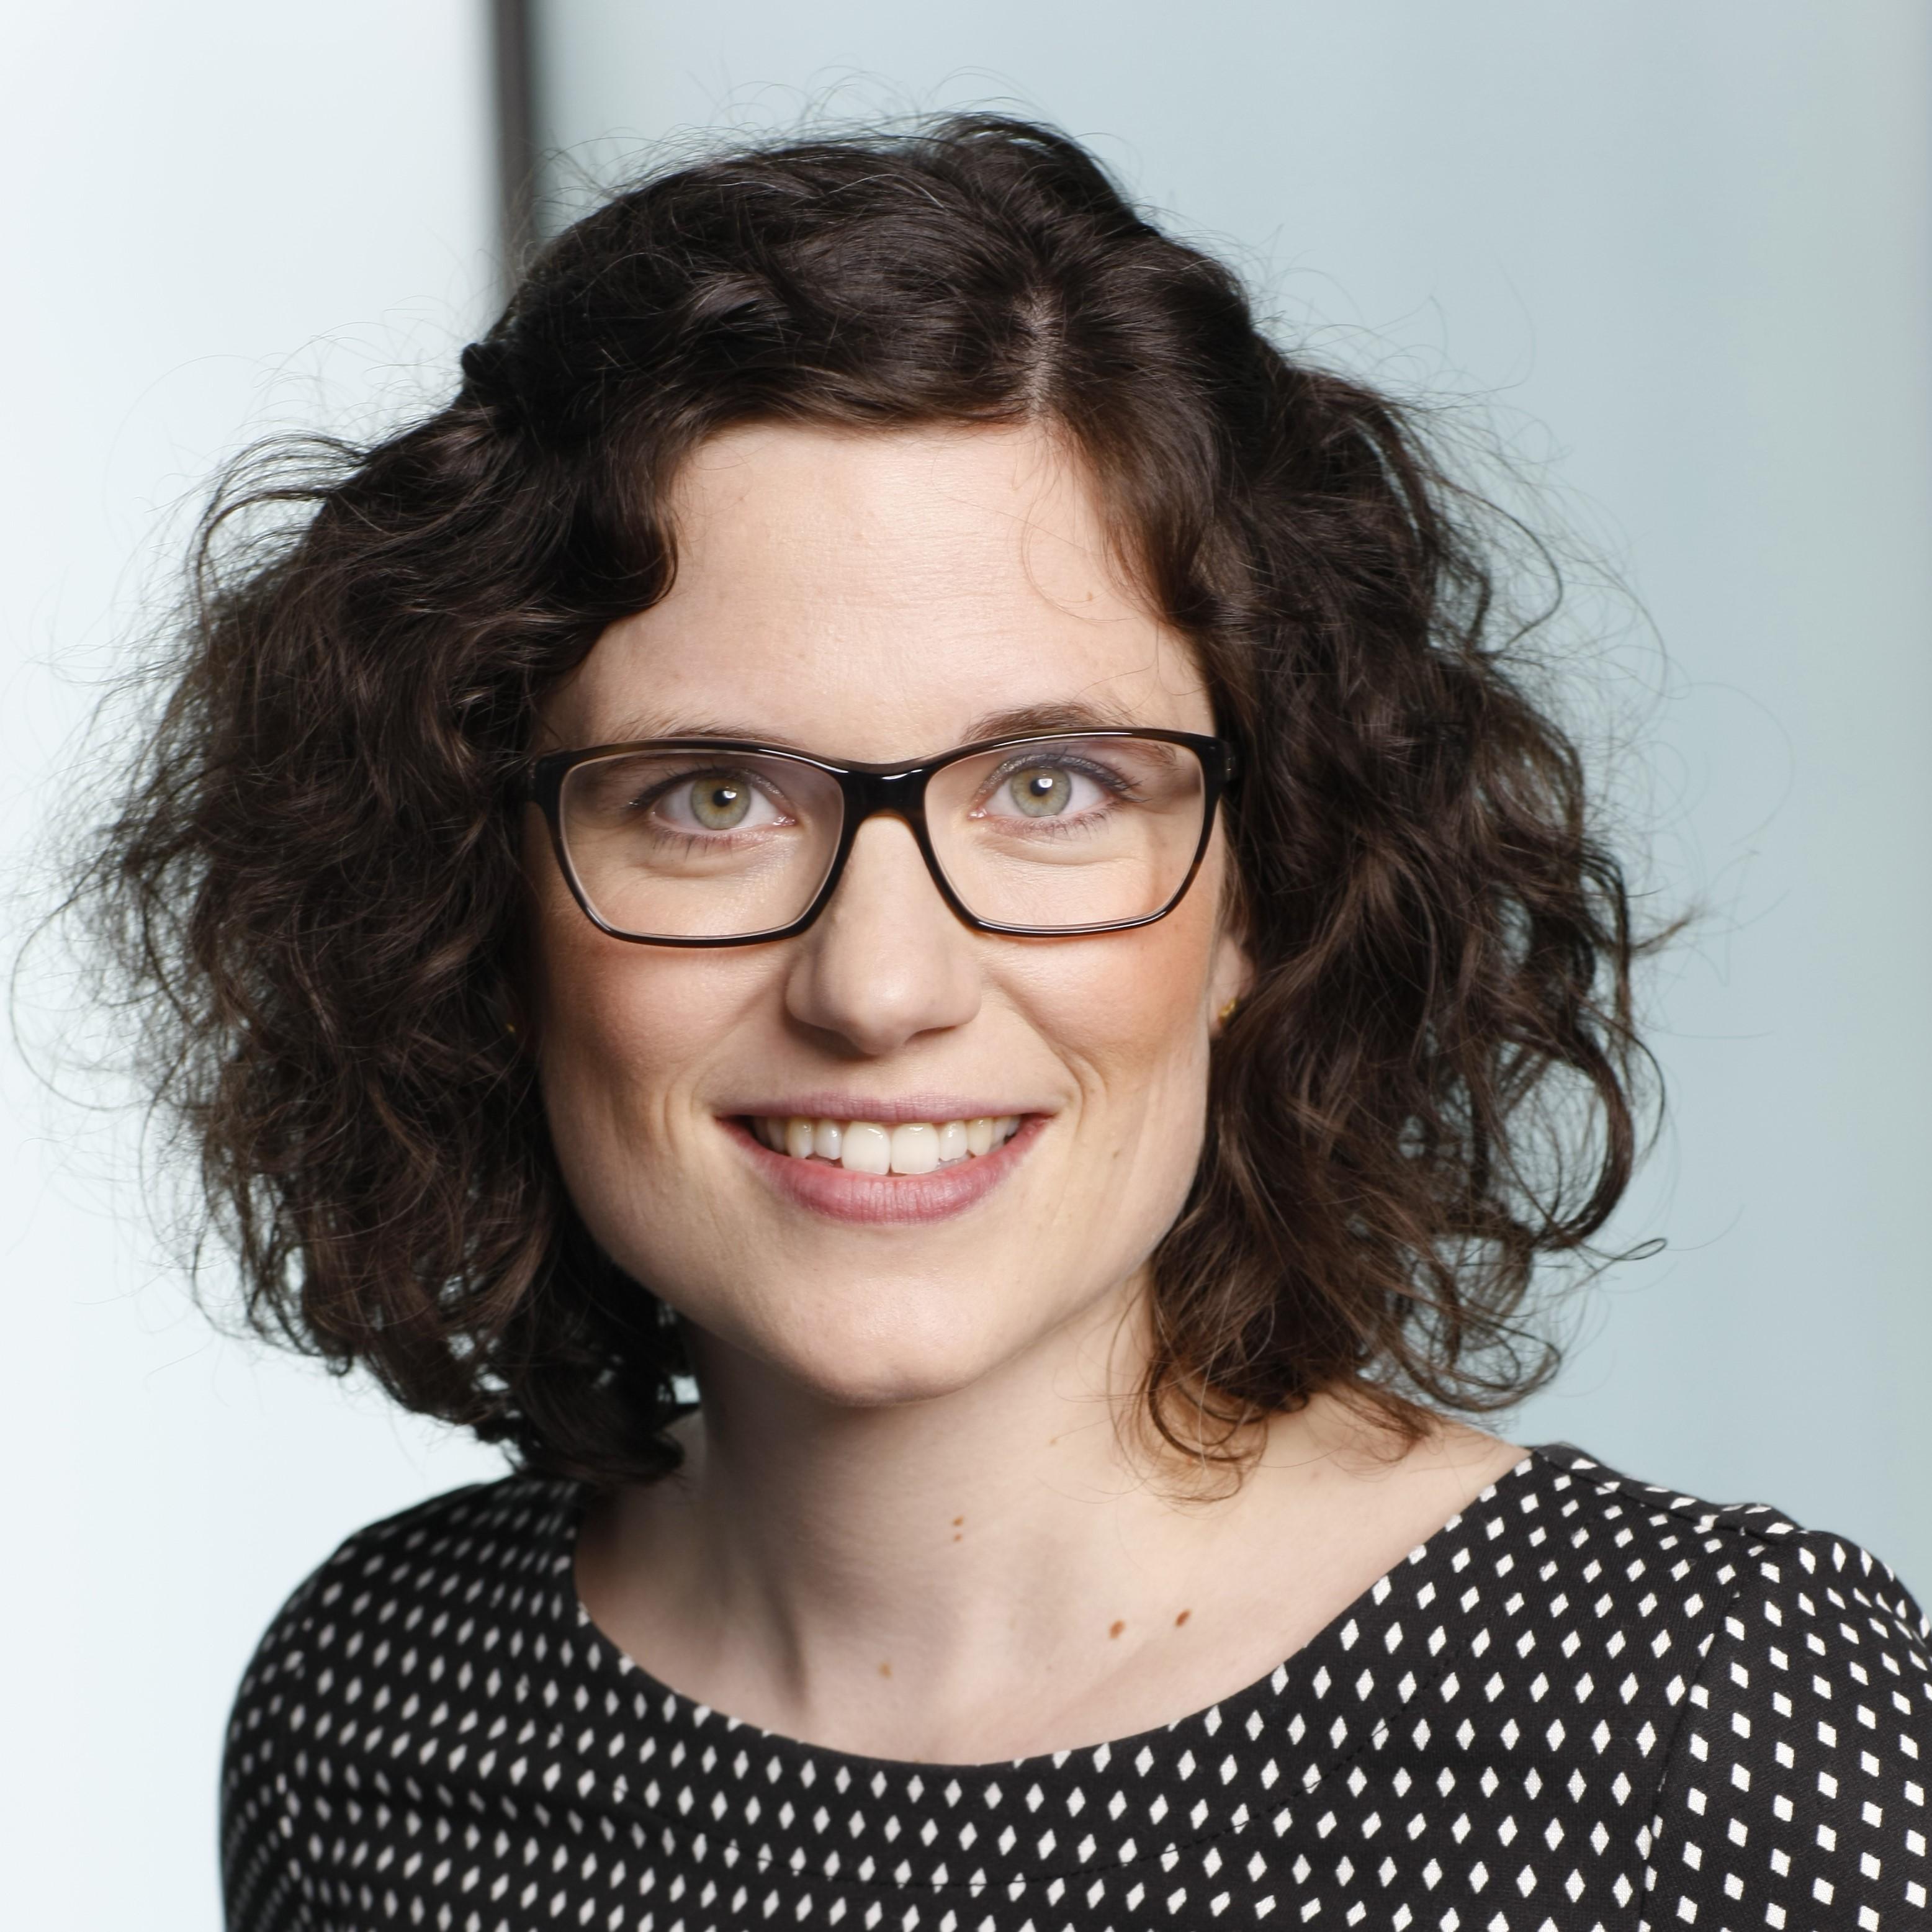 Hannah Braselmann